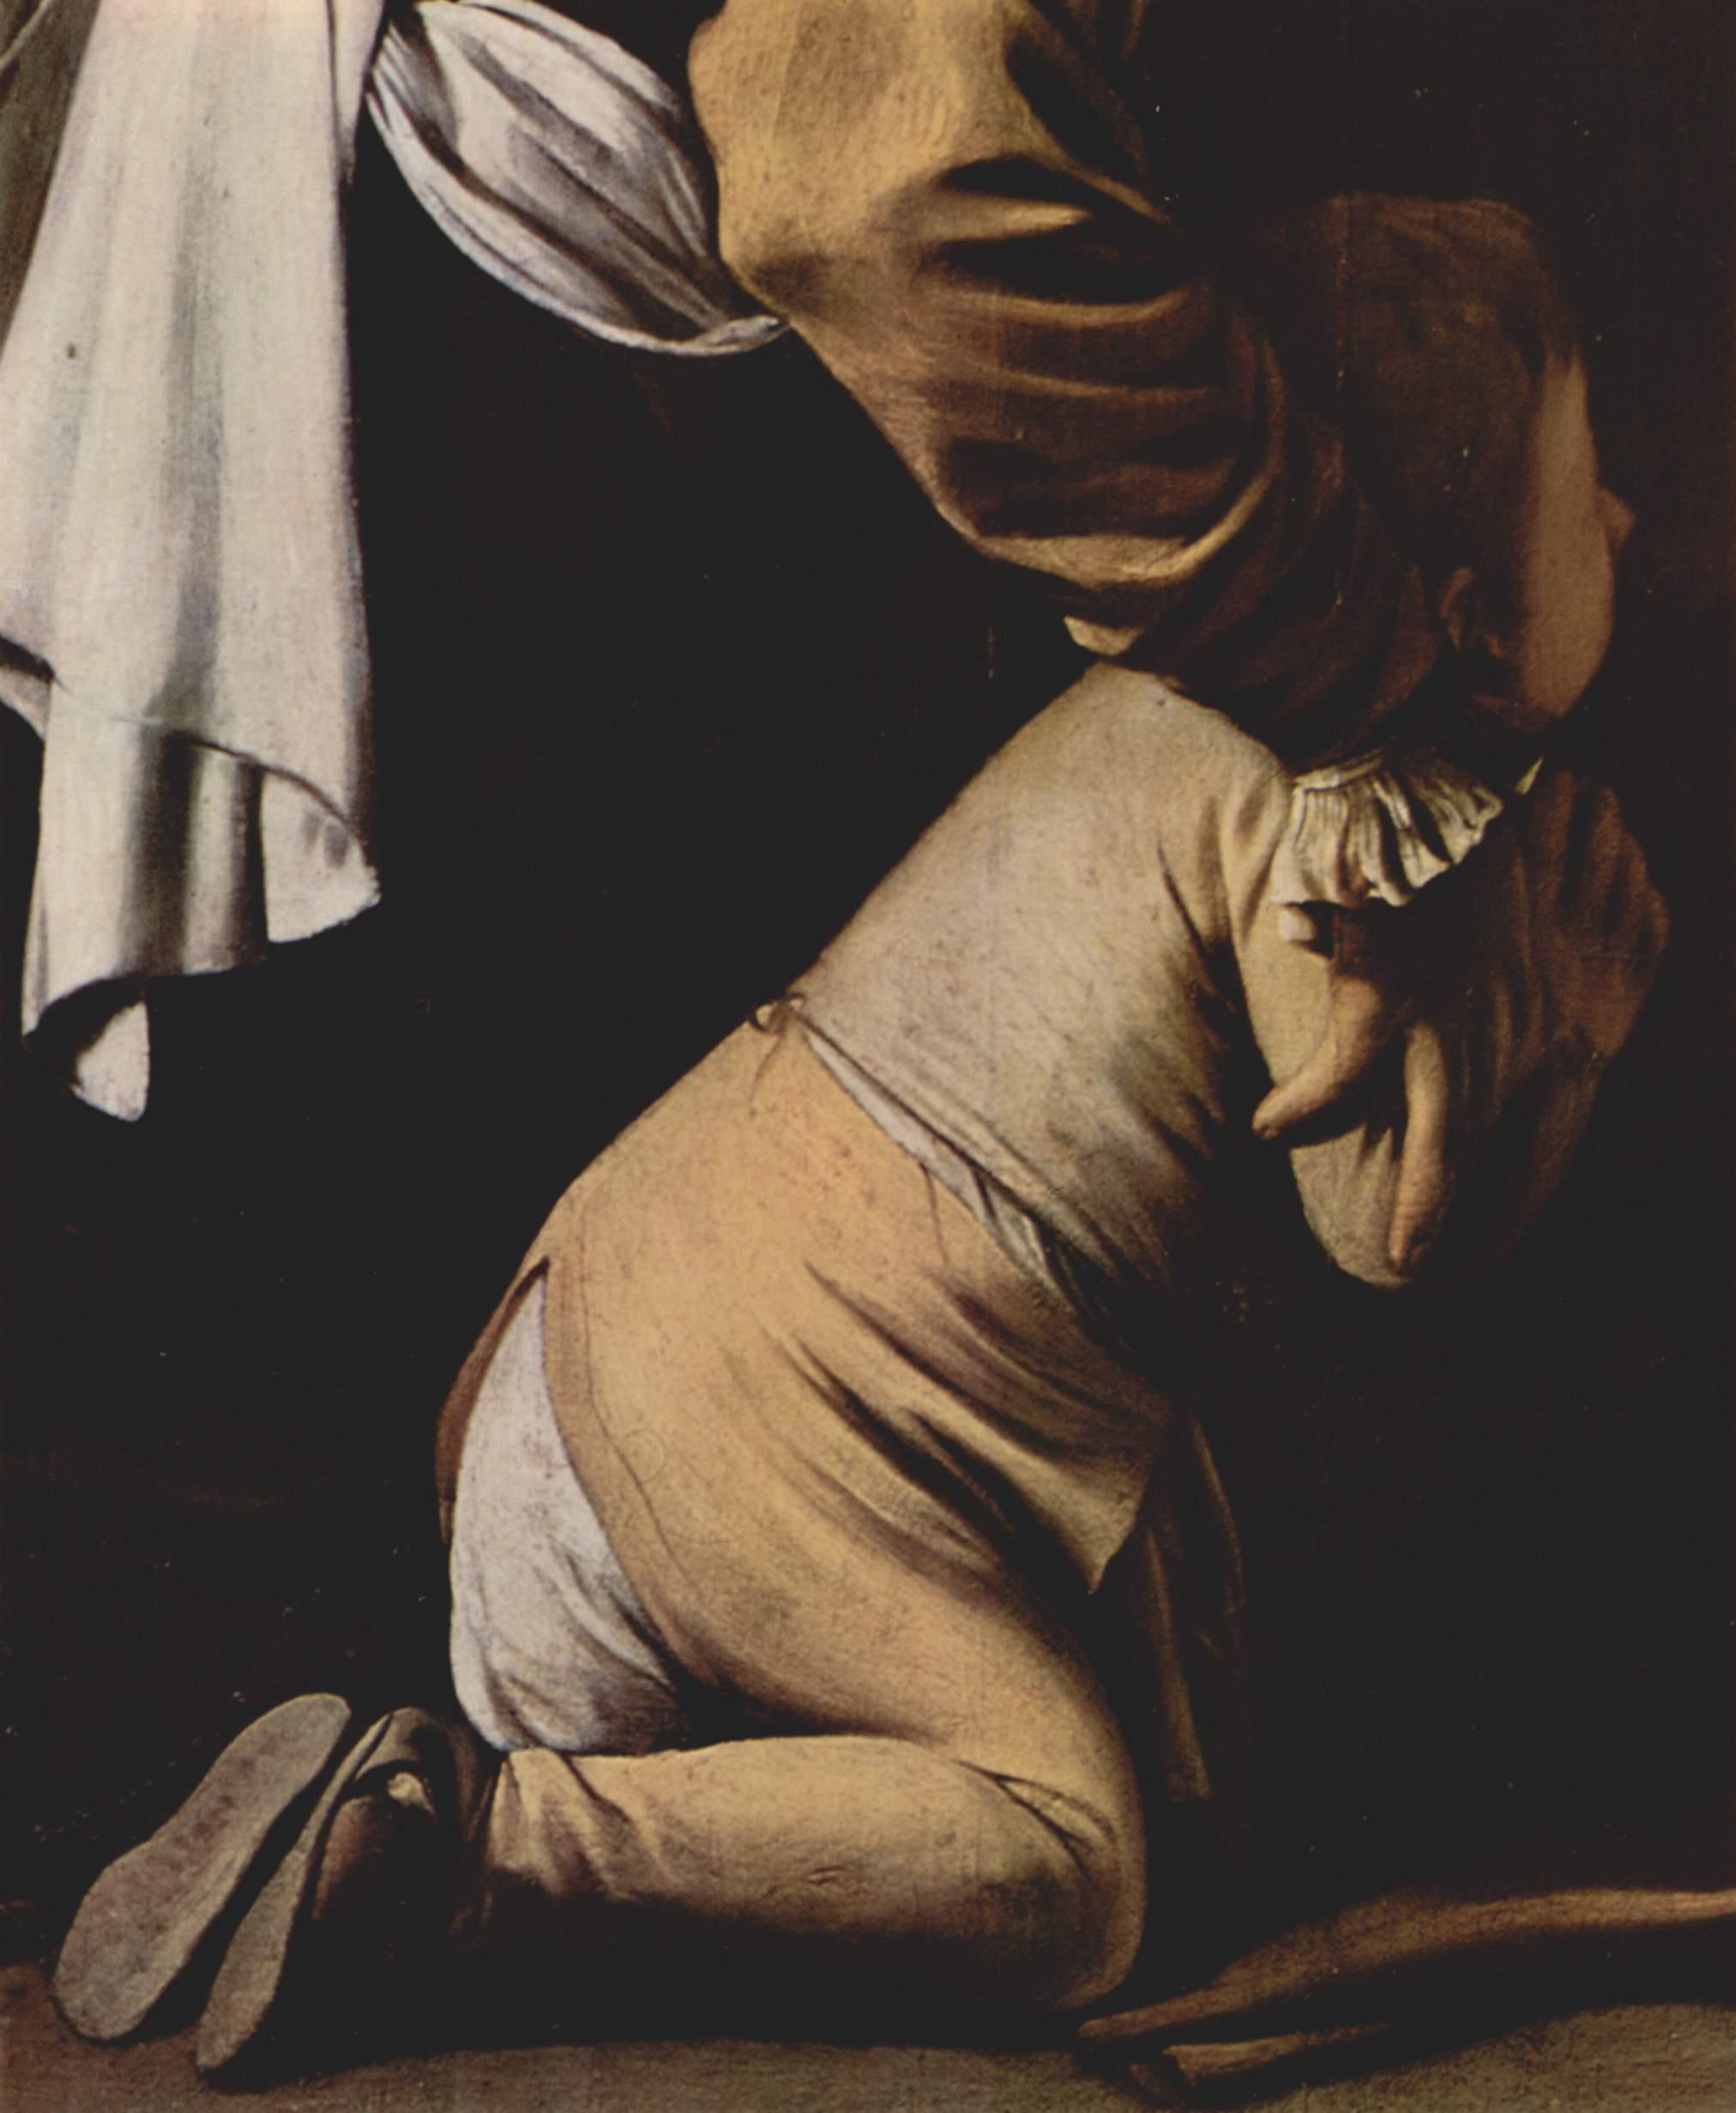 Мадонна с четками. Деталь, Микеланджело Меризи де Караваджо